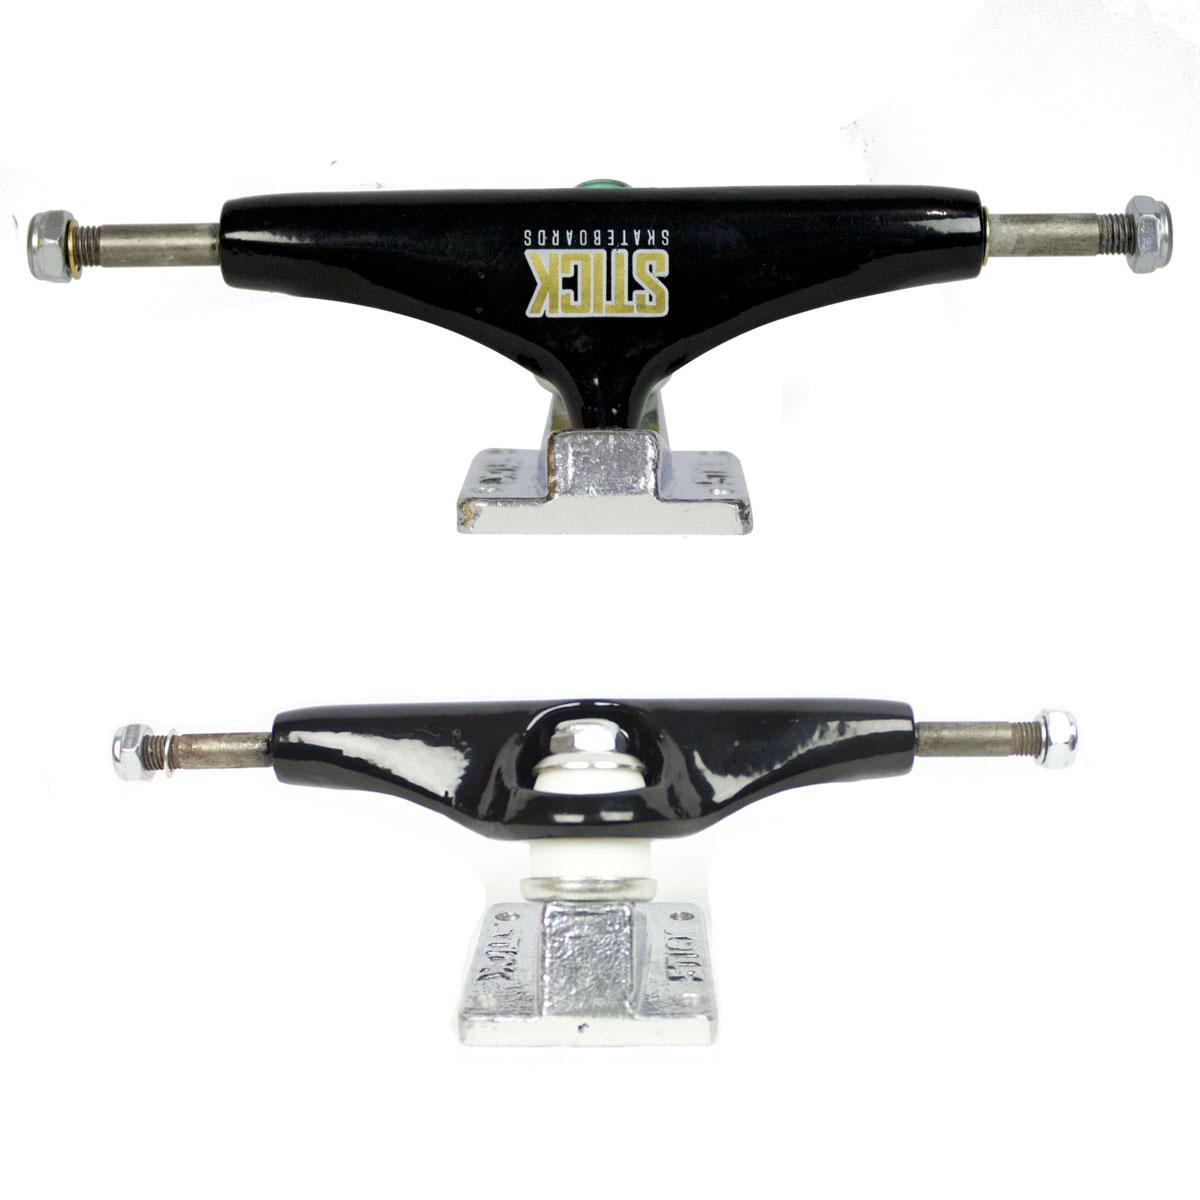 Truck Stick Skate Semi Pro 139mm